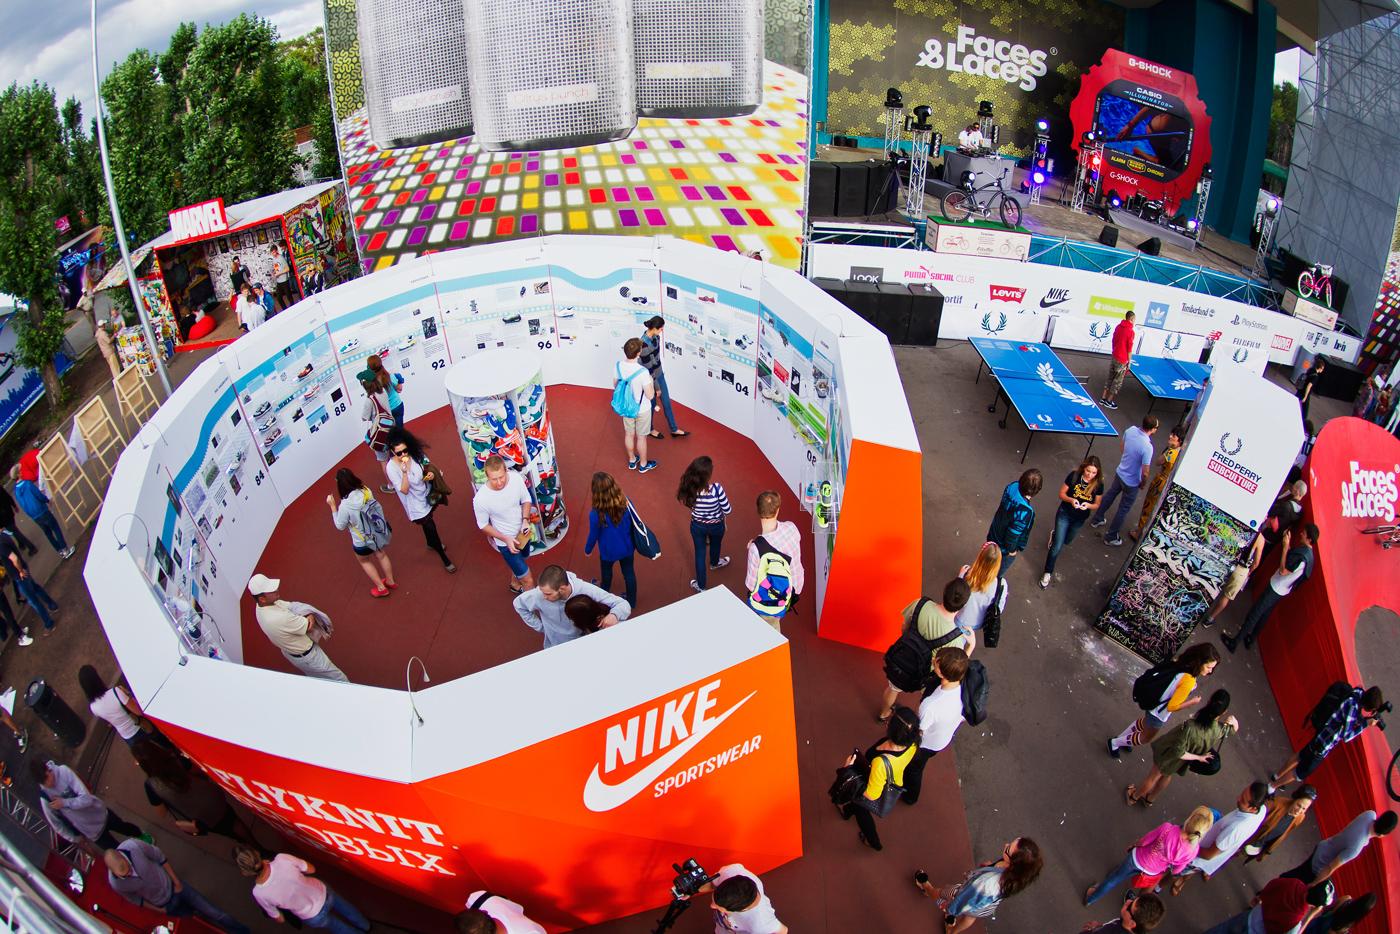 NikeTimeline_portfolio_1400x790_01.jpg